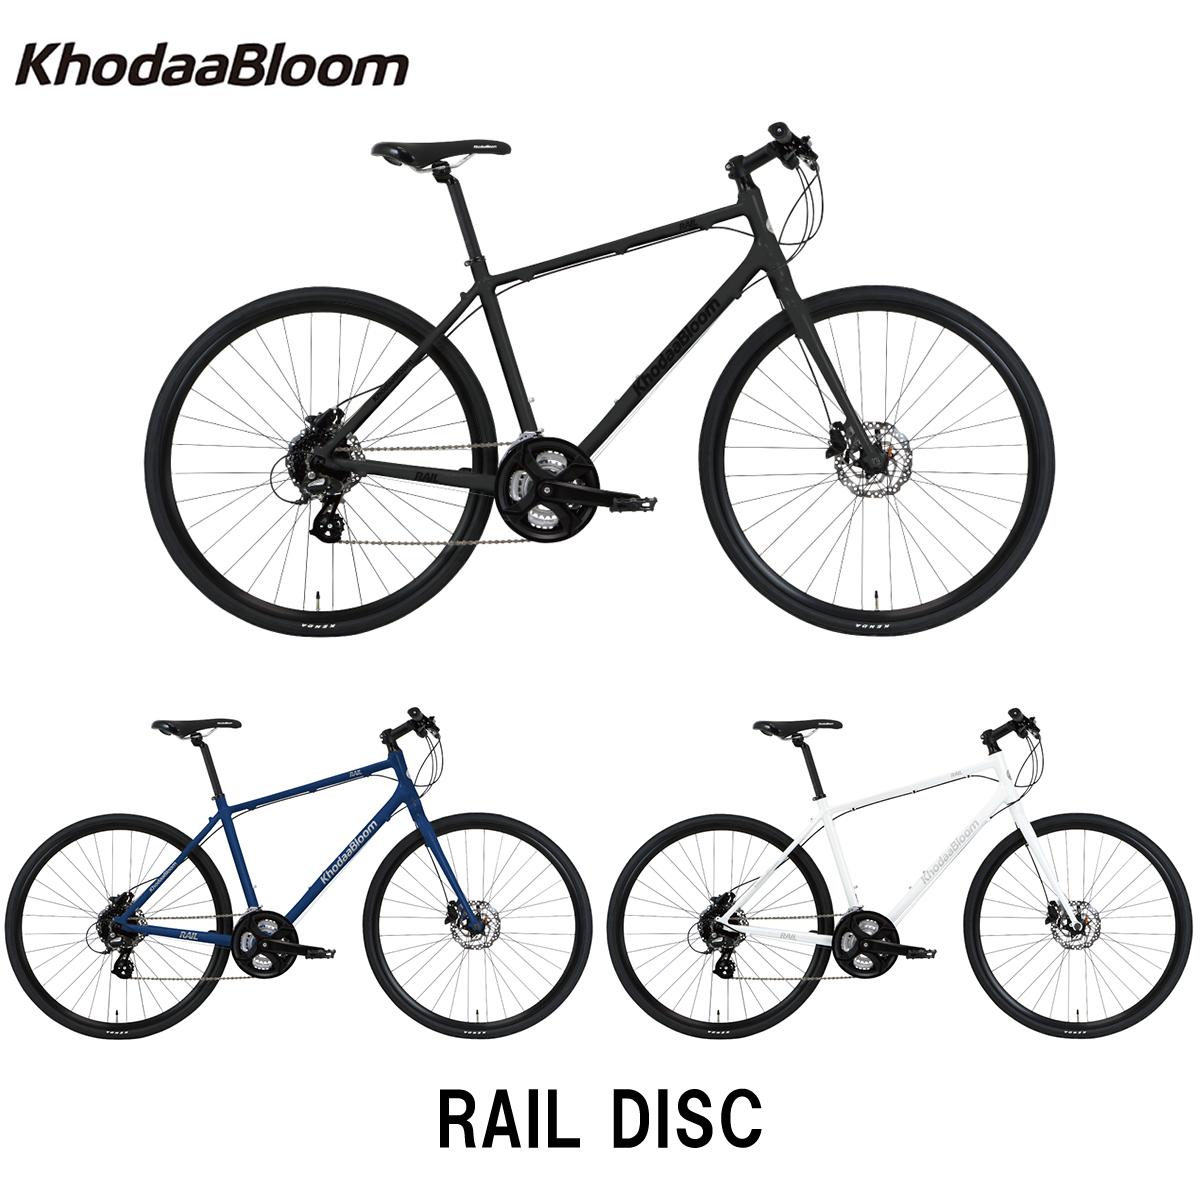 KhodaaBloom(コーダーブルーム) 2020年モデル RAIL DISC(レイルディスク) クロスバイク[GATE IN]